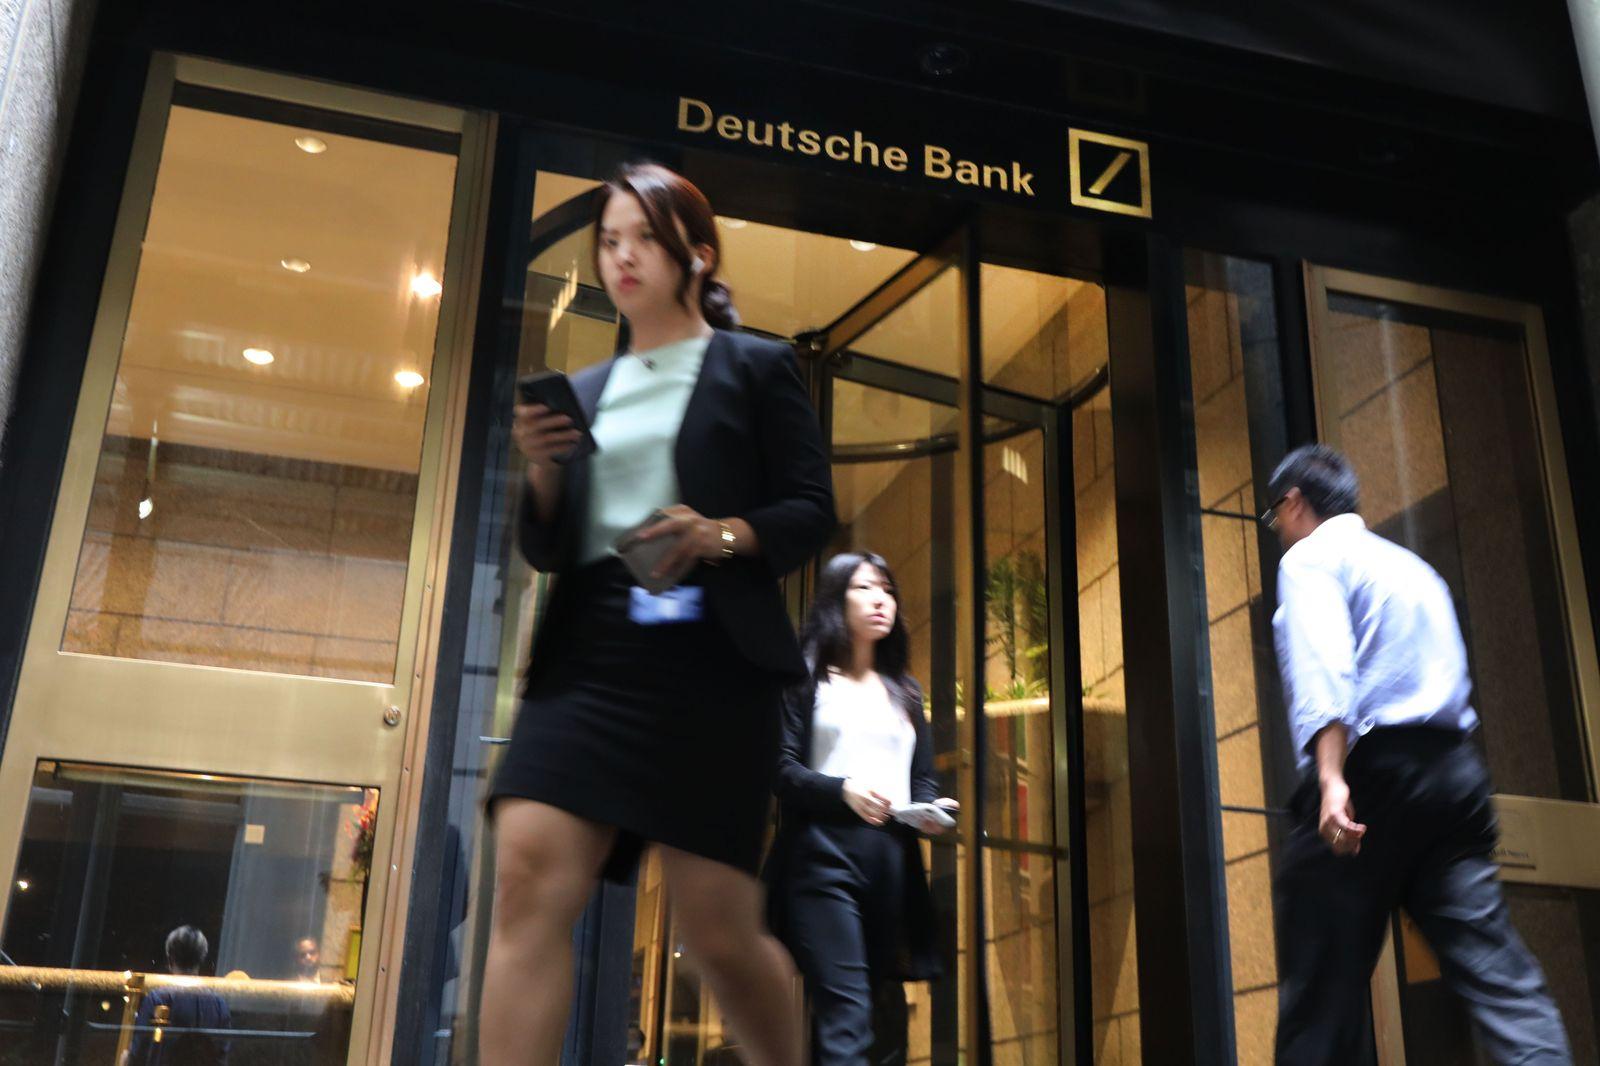 Deutsche Bank Shrinks Investment Banking Business, Cutting 18,000 Jobs